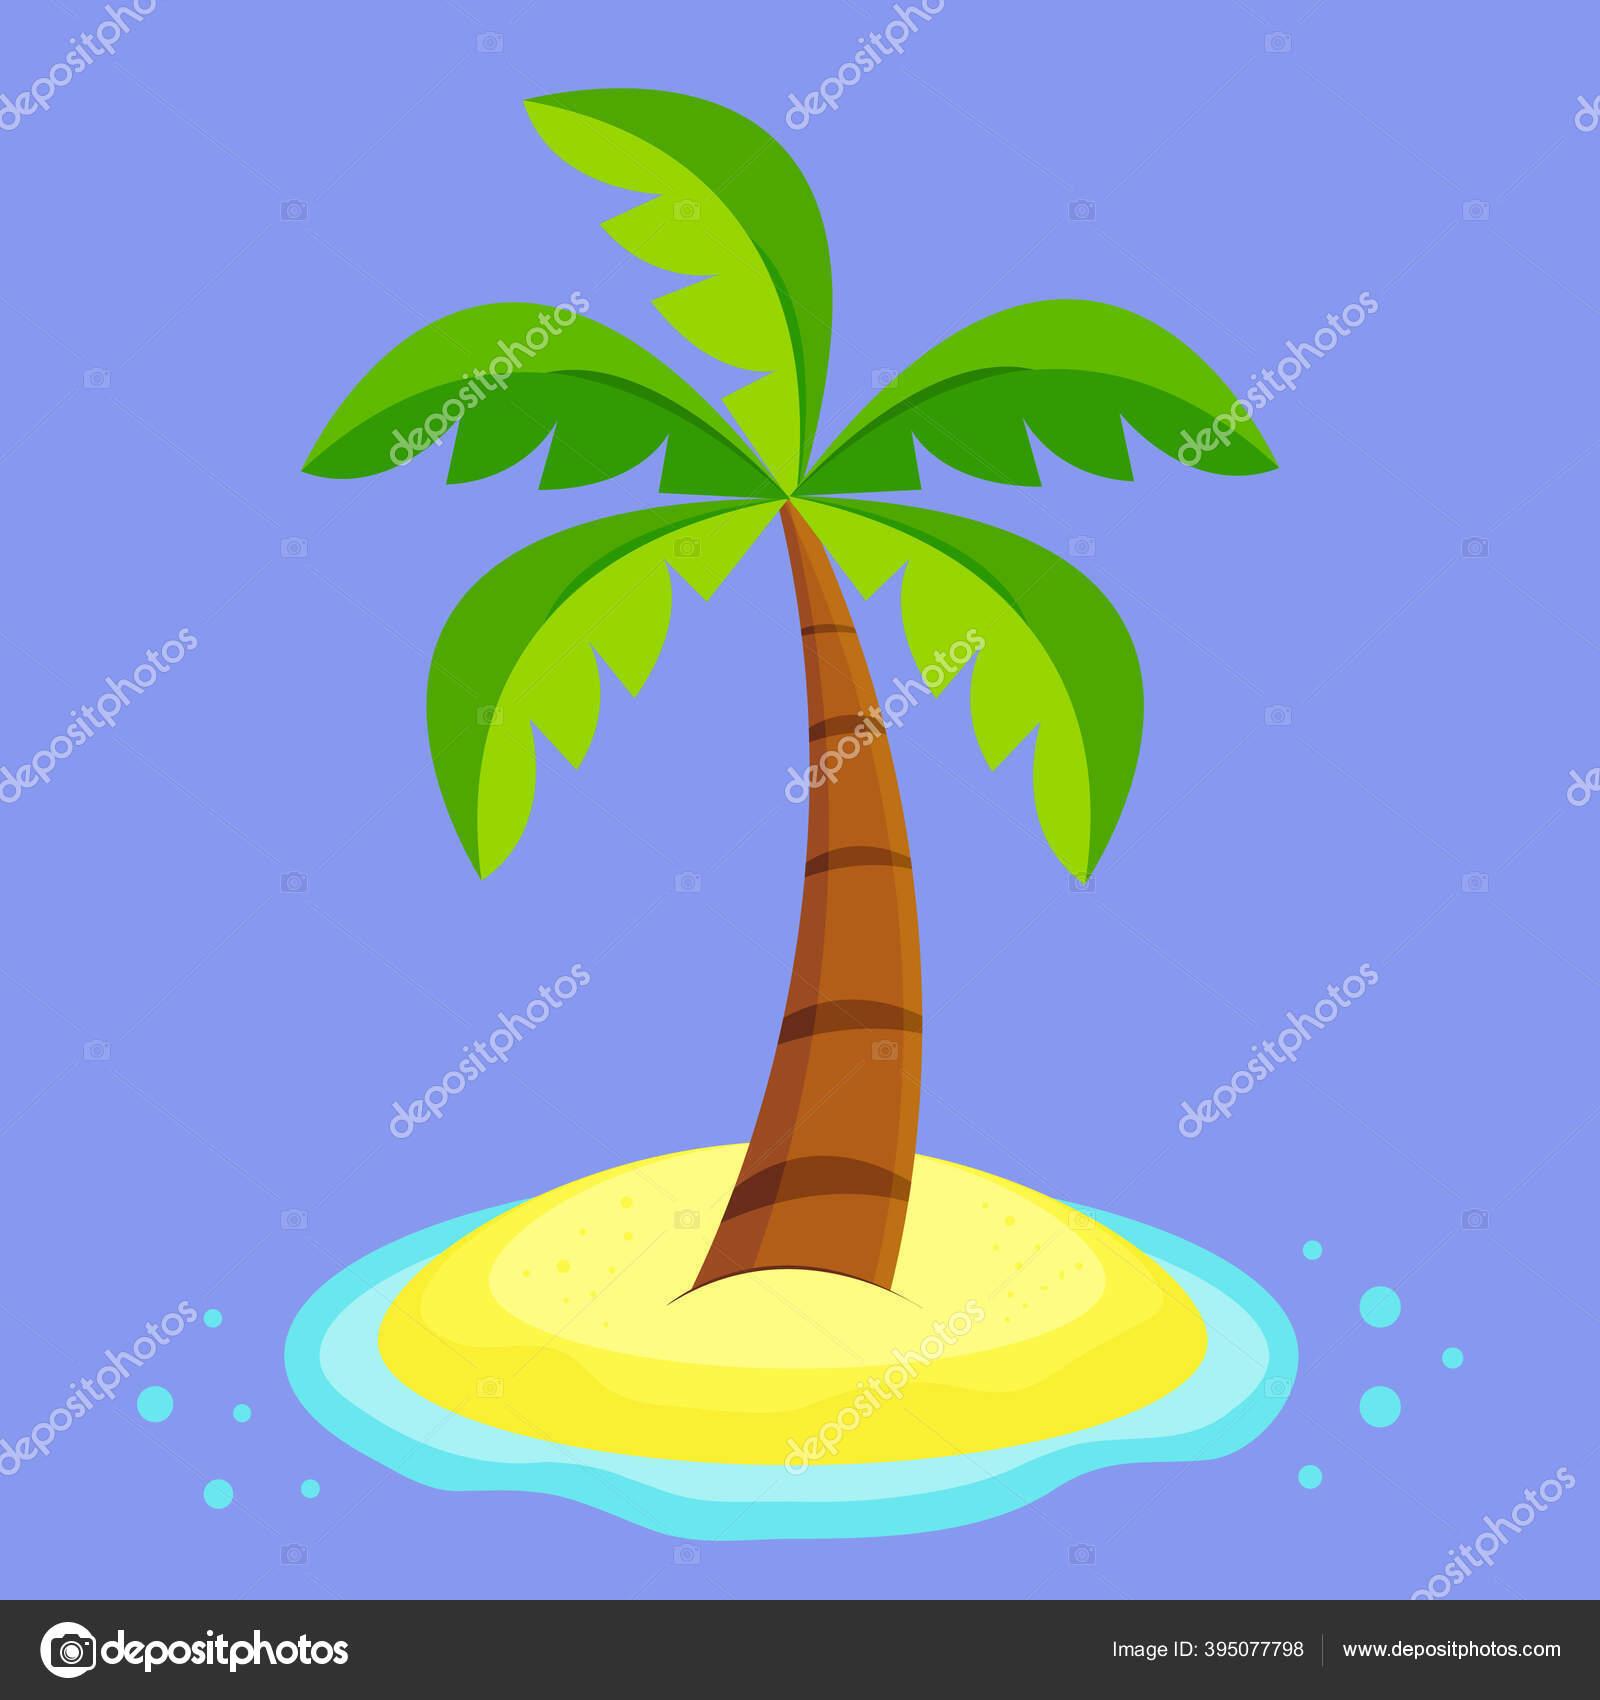 Ikon Tanaman Grafis Klip Gurun Laut Biru Kartun Seni Tanah Stok Vektor C Anyatoporkova 395077798